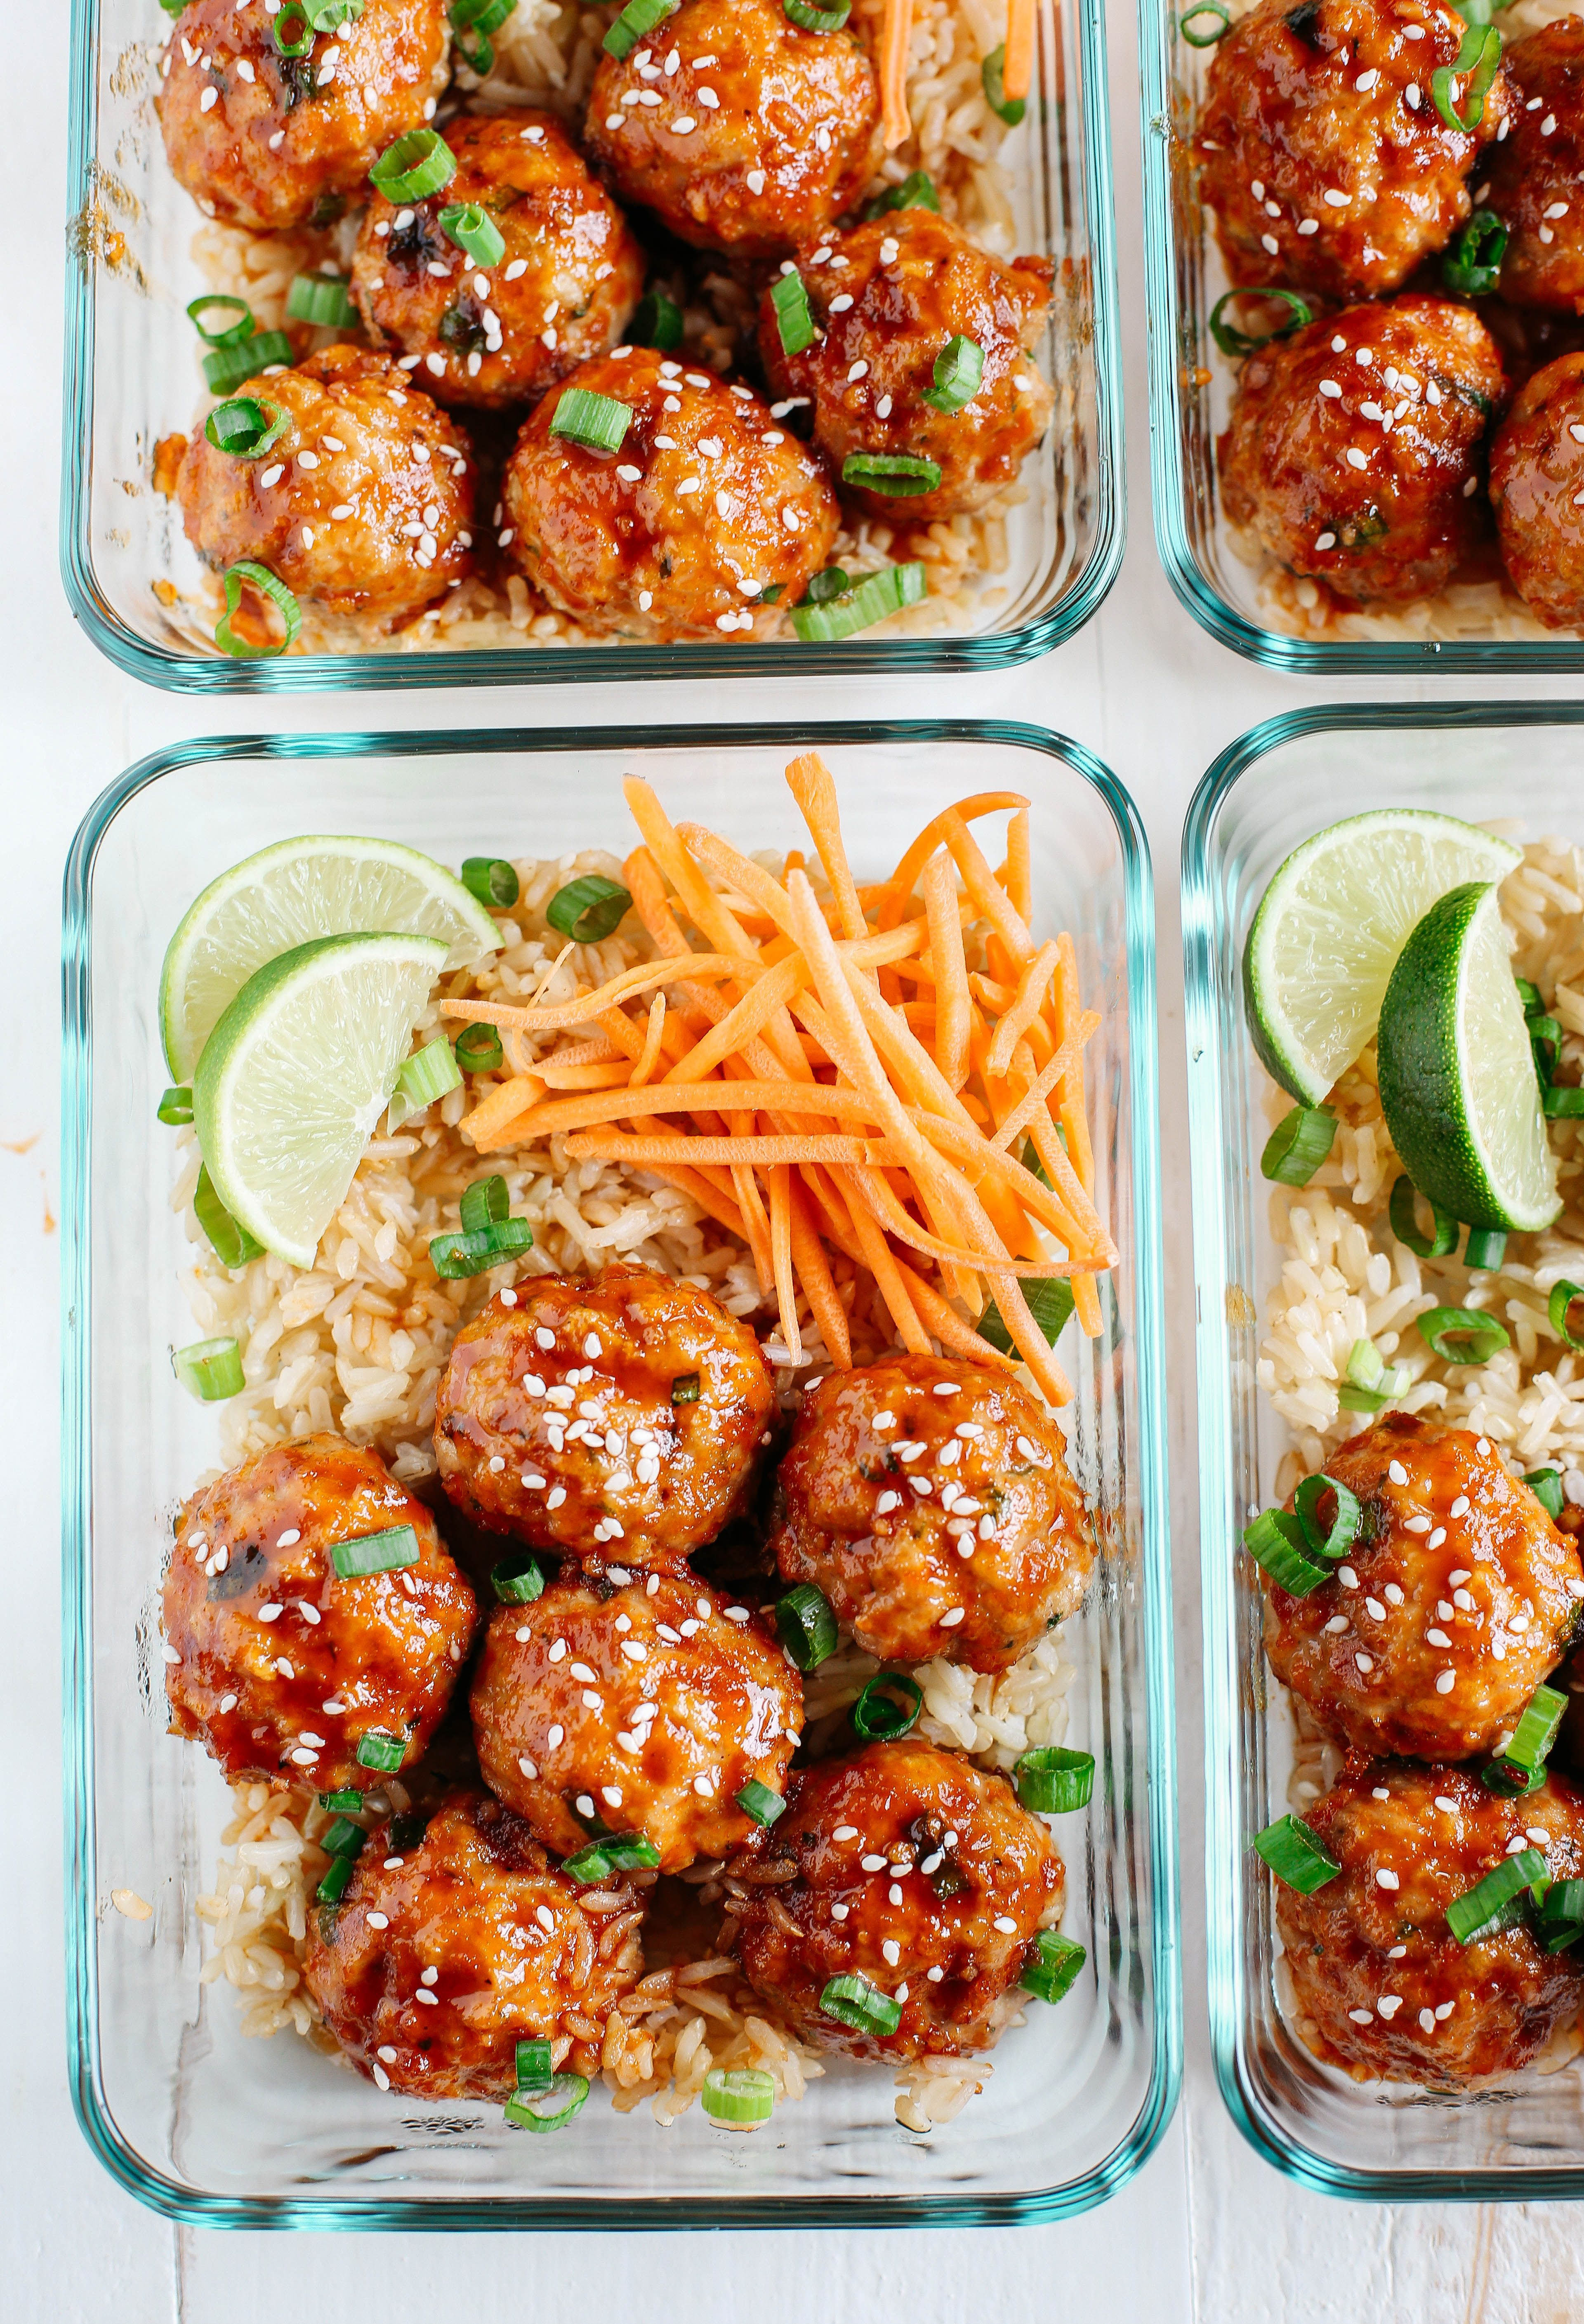 Honey Sriracha Glazed Meatballs Recipe Lunch Meal Prep